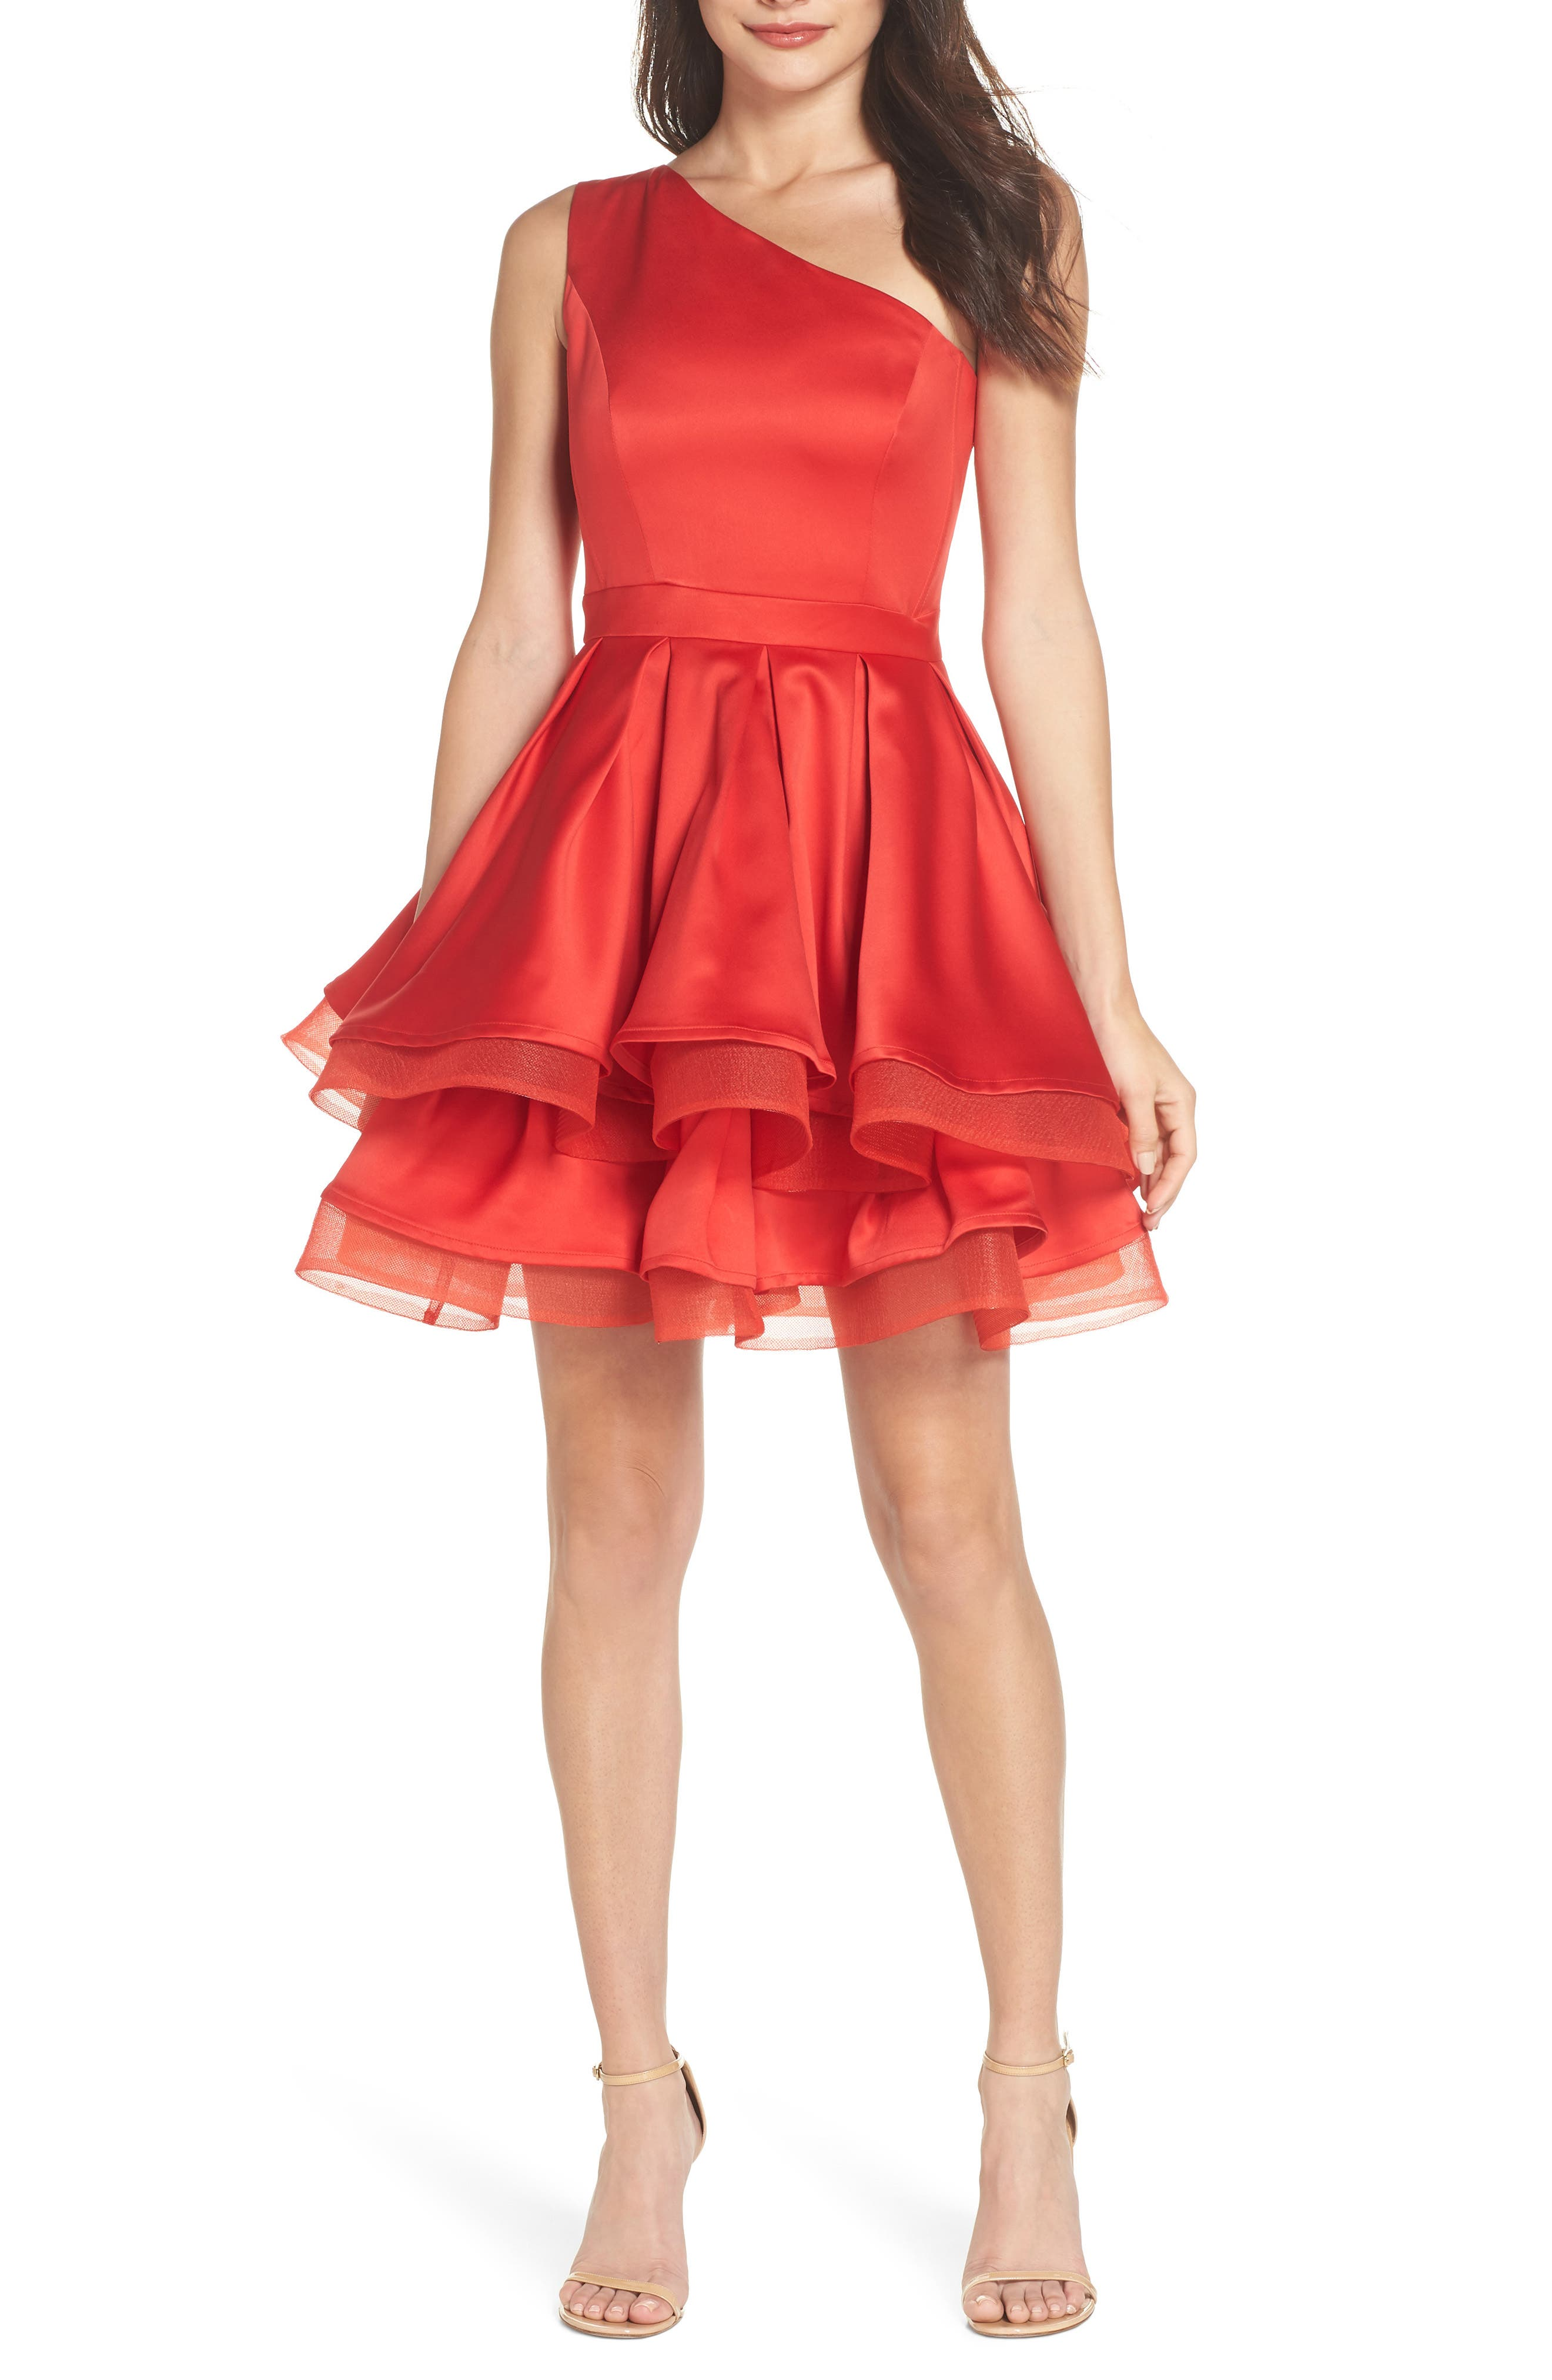 Emmanuel One-Shoulder Party Dress,                         Main,                         color, 600